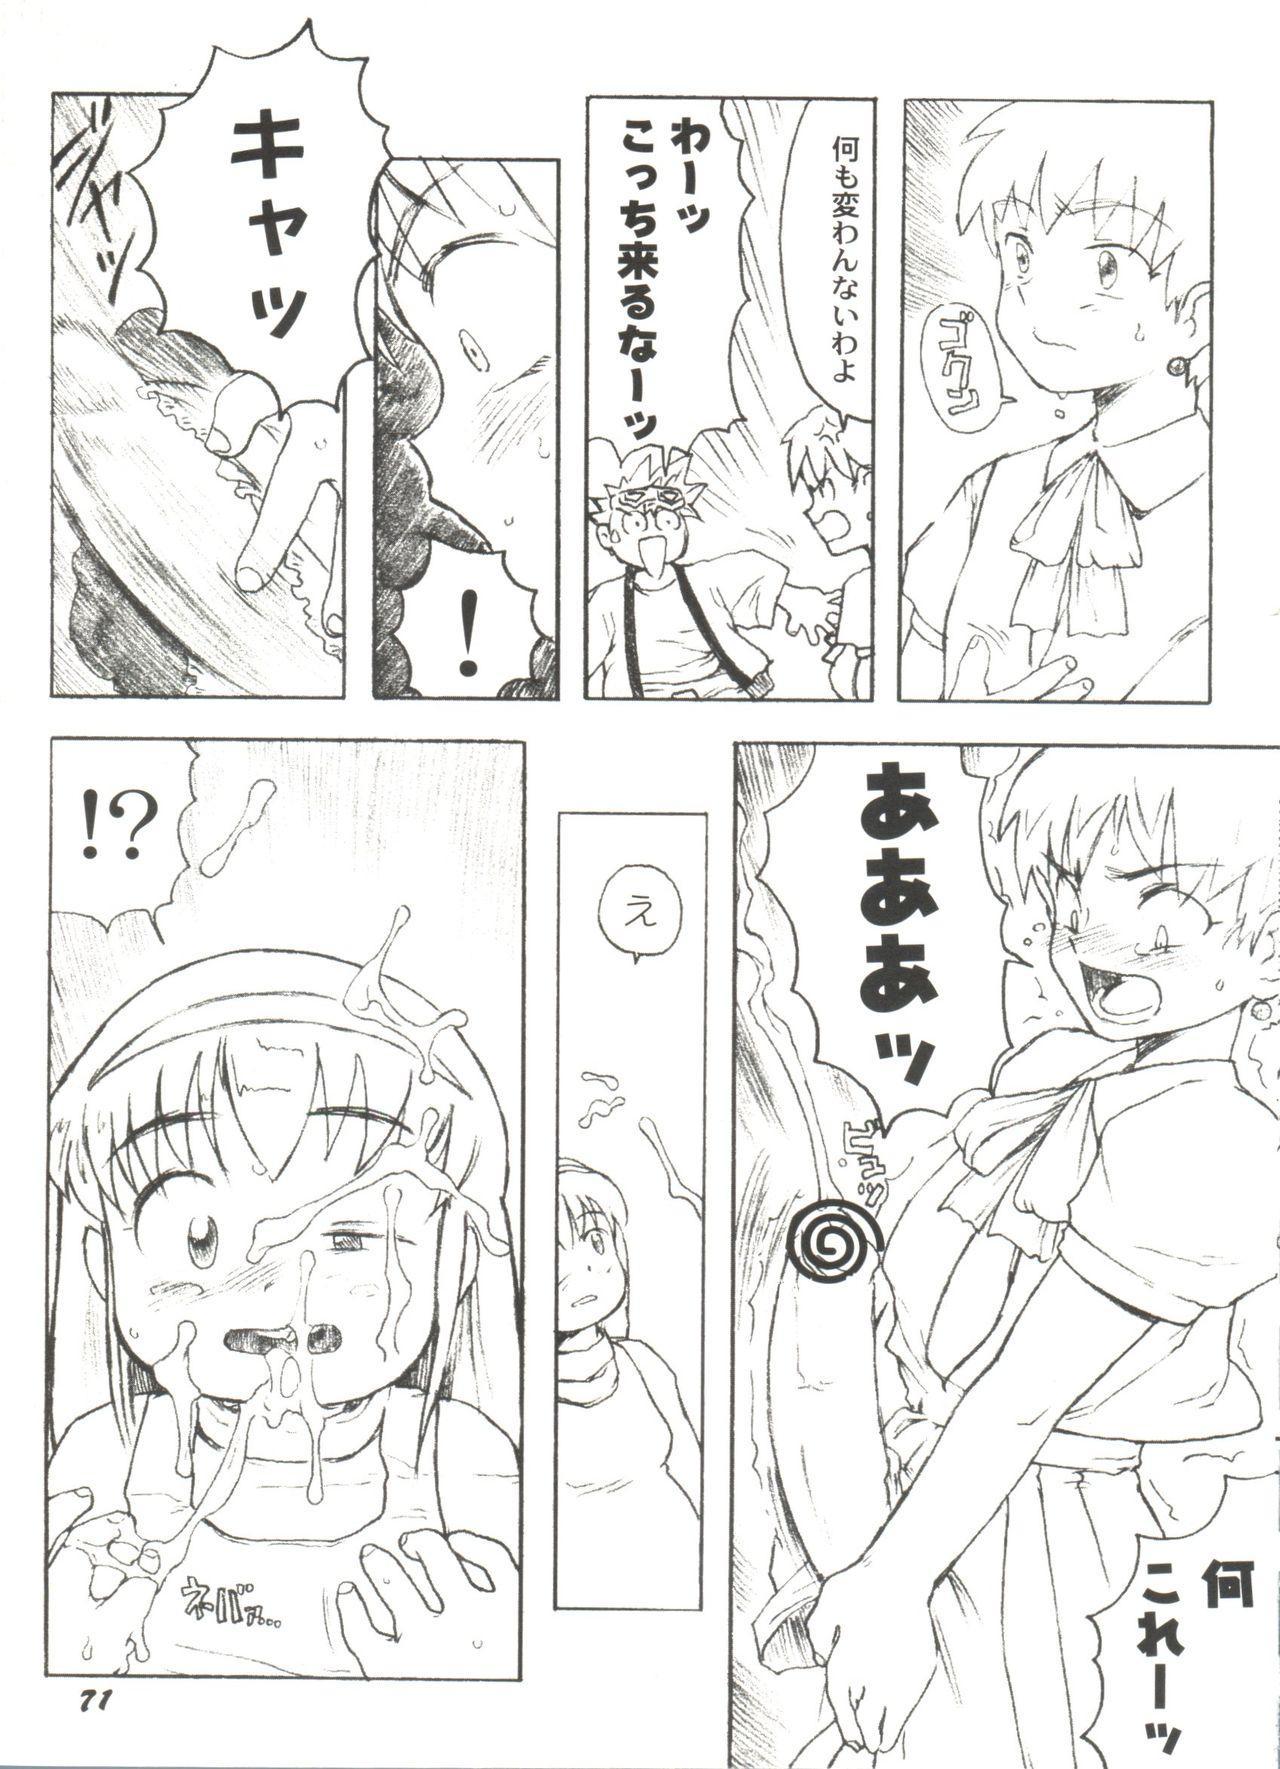 [Anthology] Denei Tamatebako 8 - Utakata no Tenshi-tachi II (Various) 72